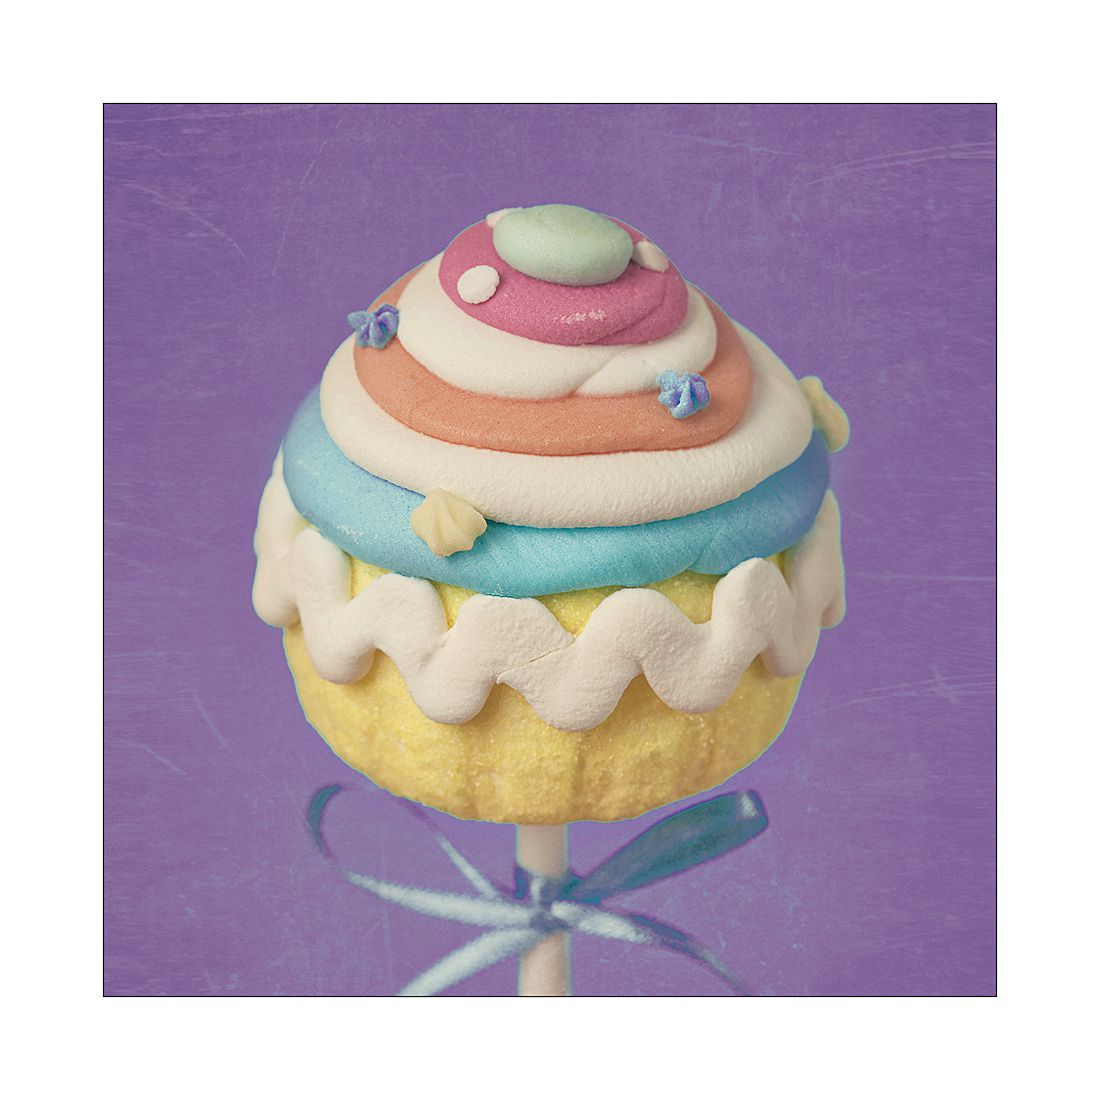 Kunstdruck cake pops II – Größe: 30 x 30 cm, Pro Art günstig